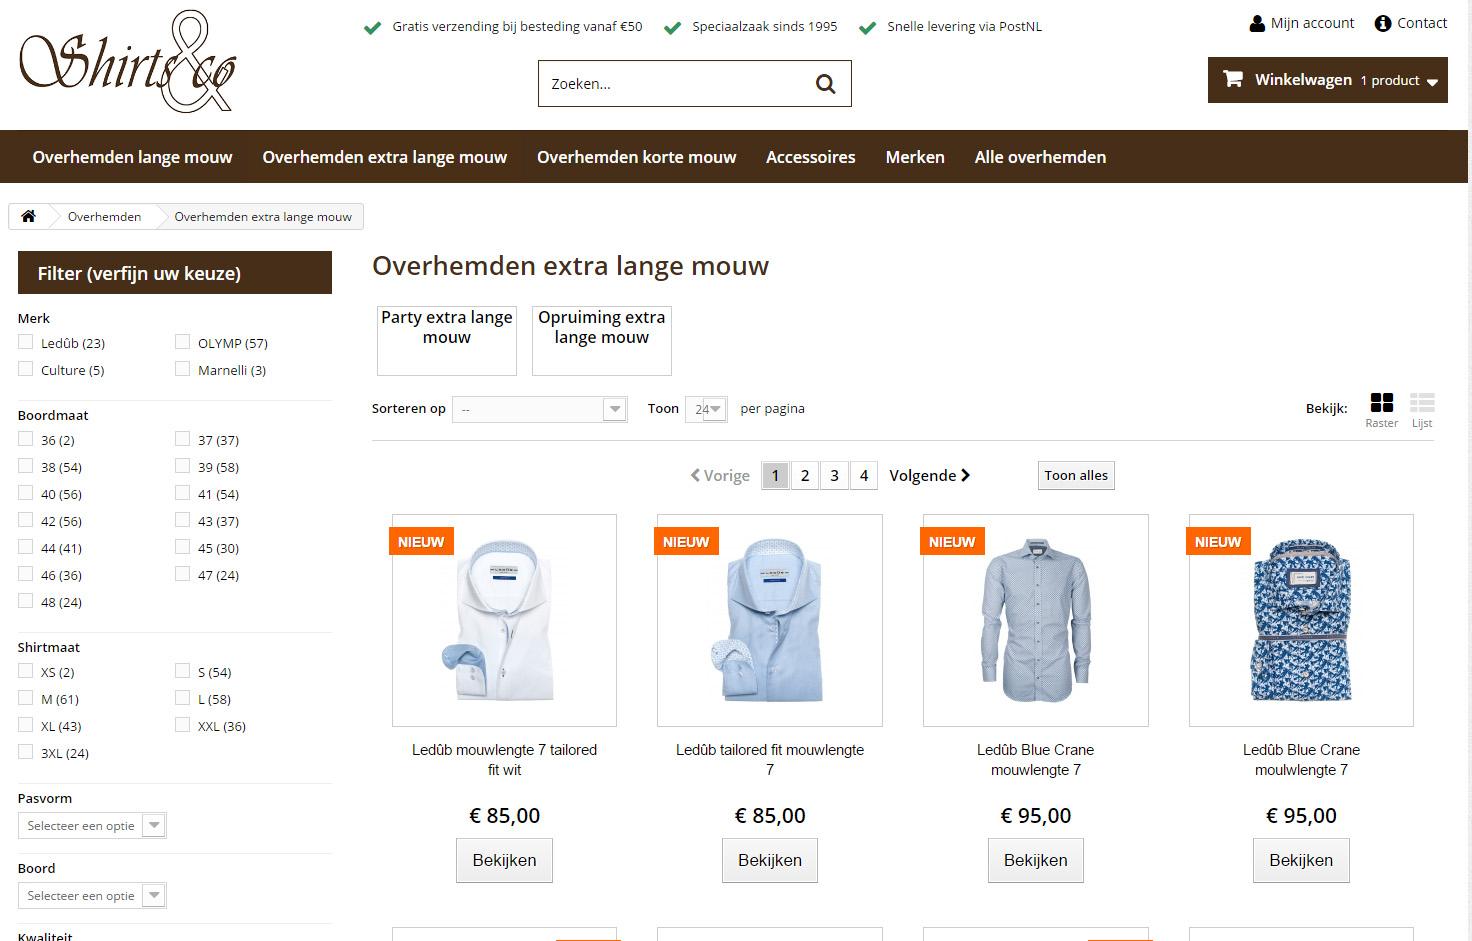 Shirts & co webshop